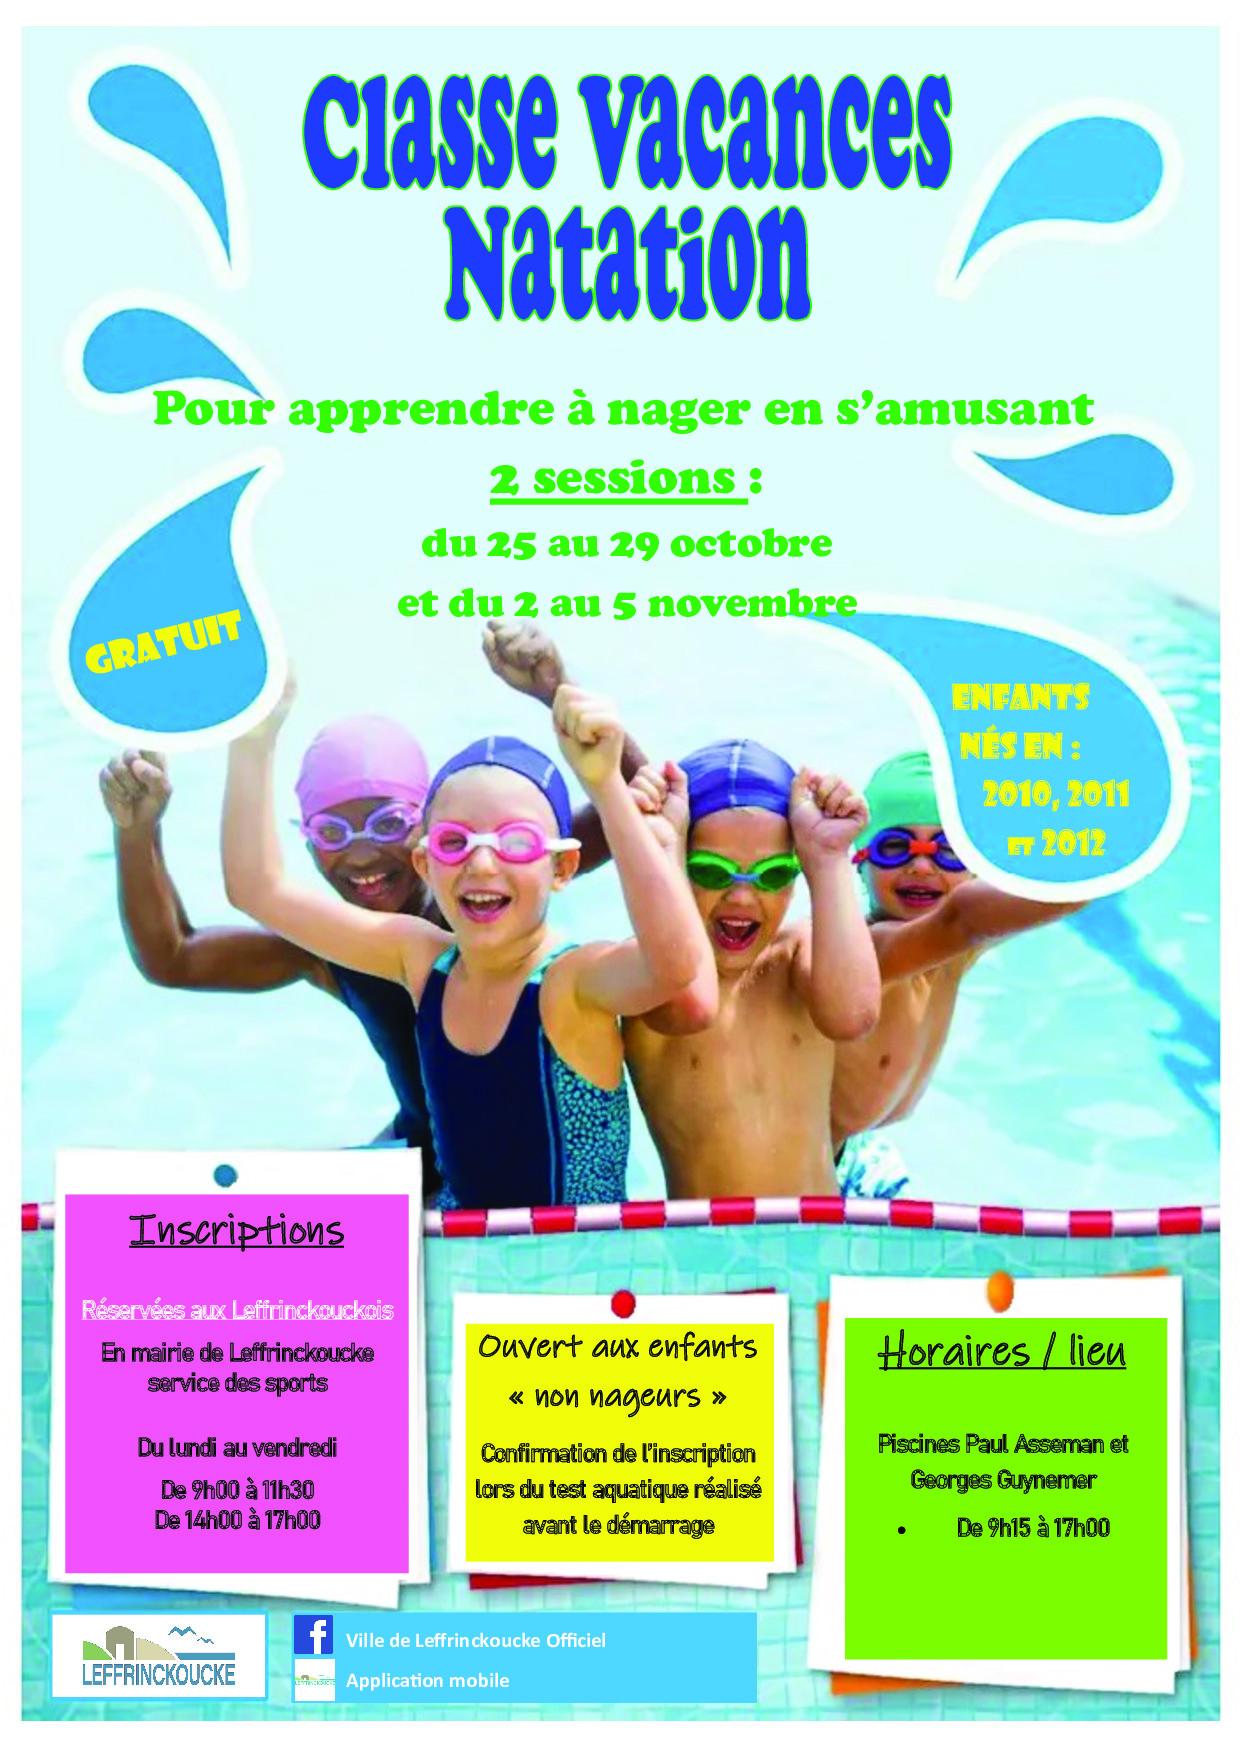 Classe Vacances Natation.jpg